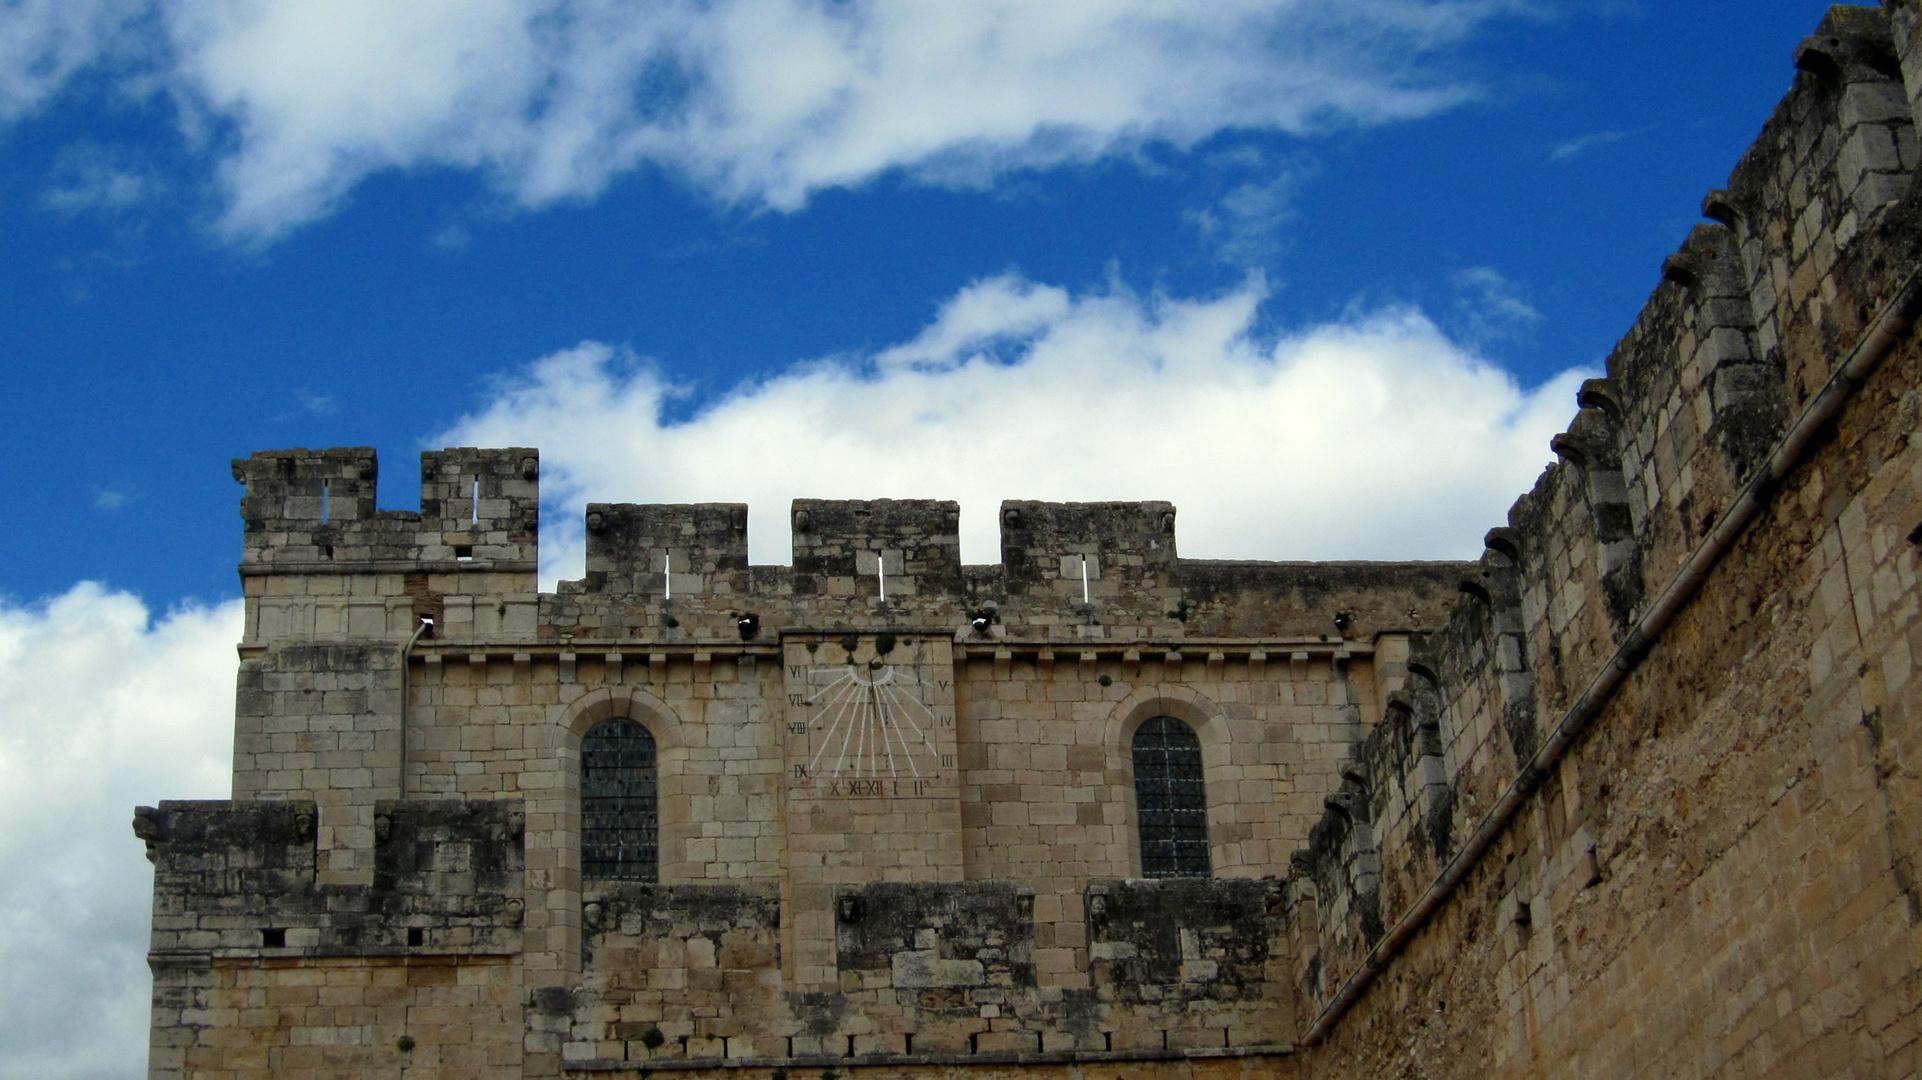 Kloster Santes Creus